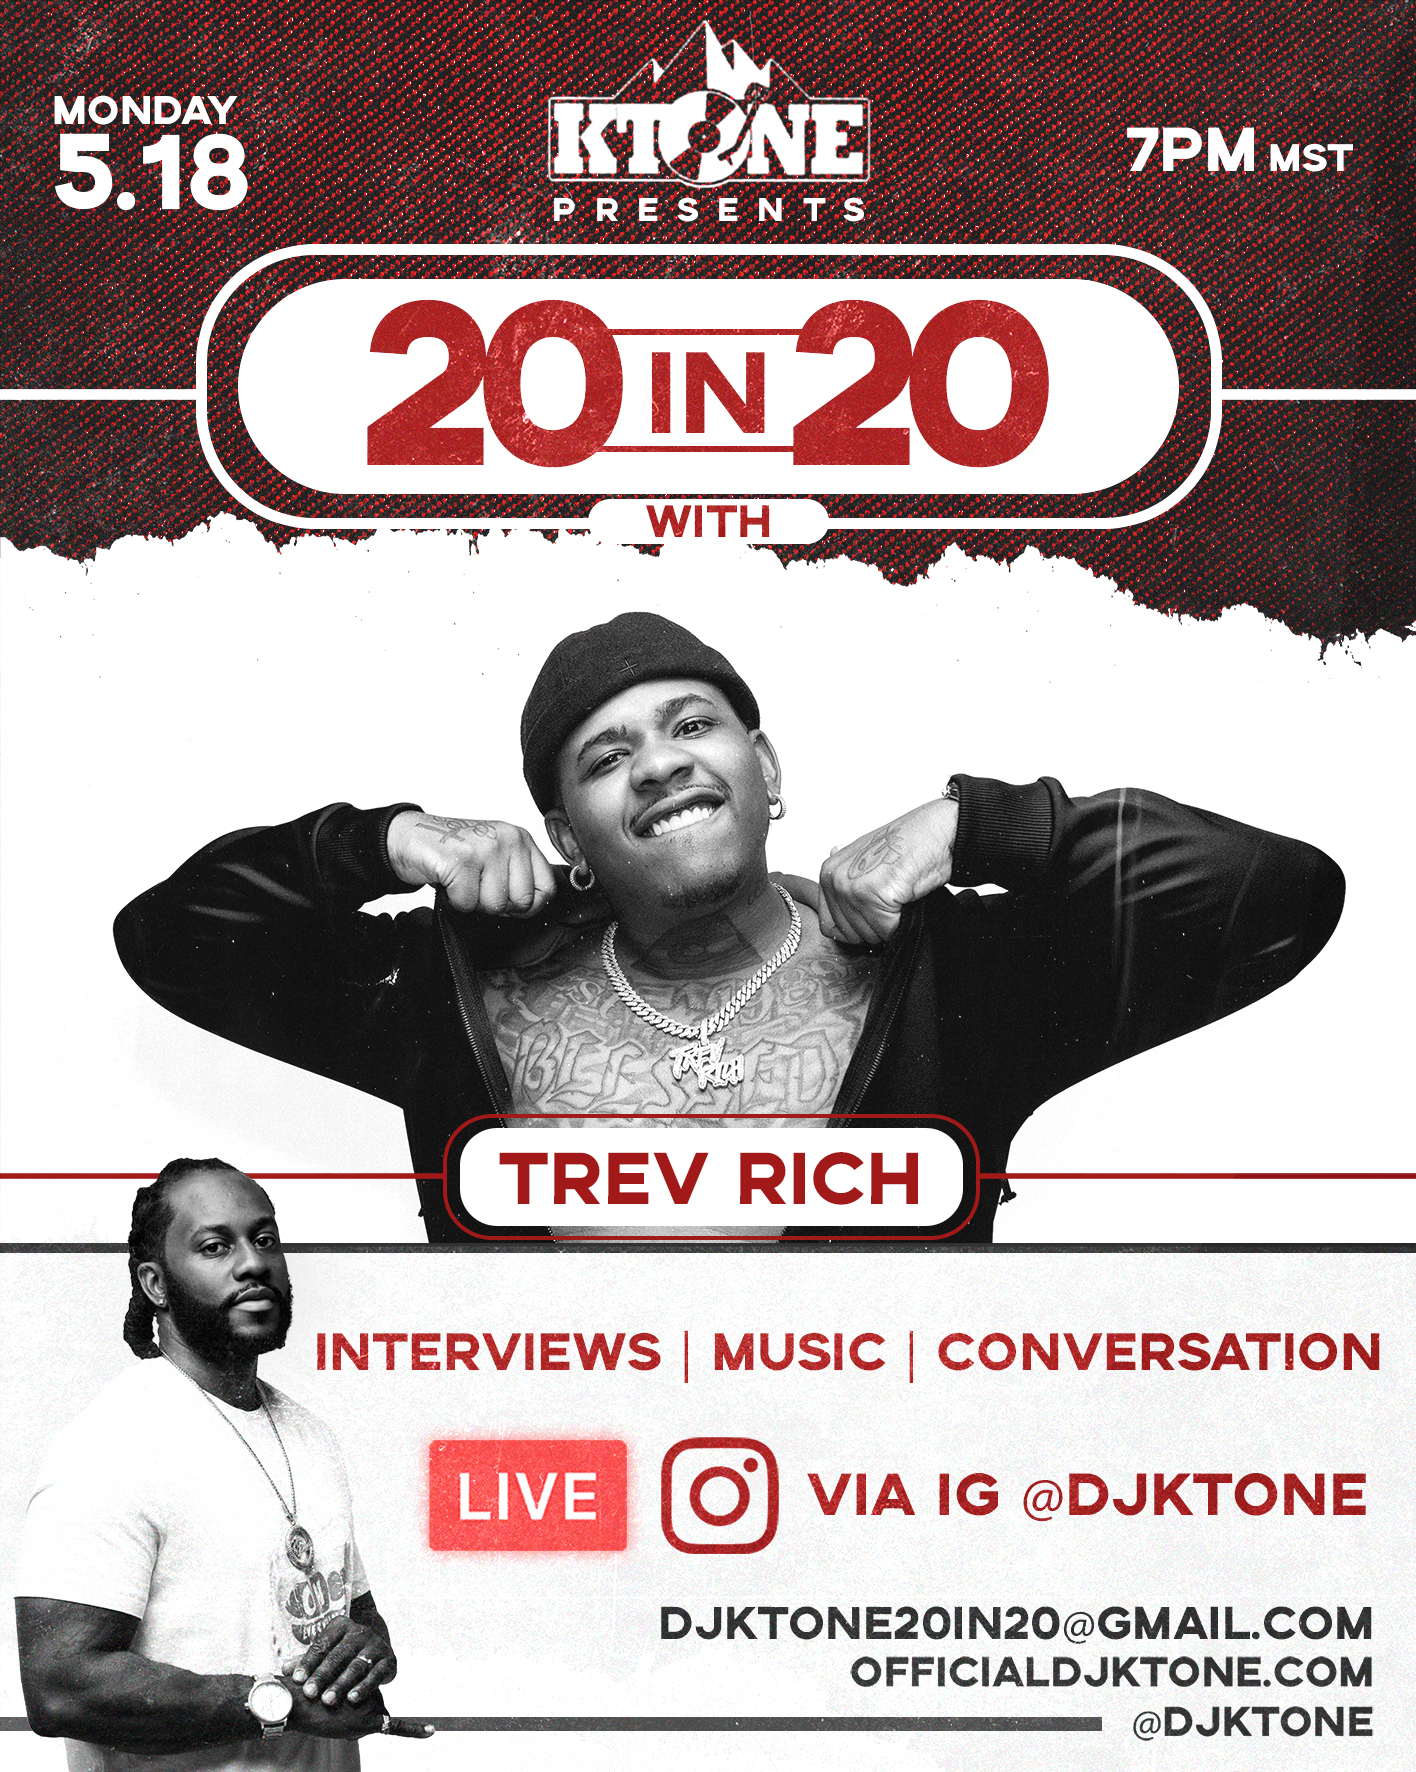 DJ Ktone 20 in 20 with Trev Rich